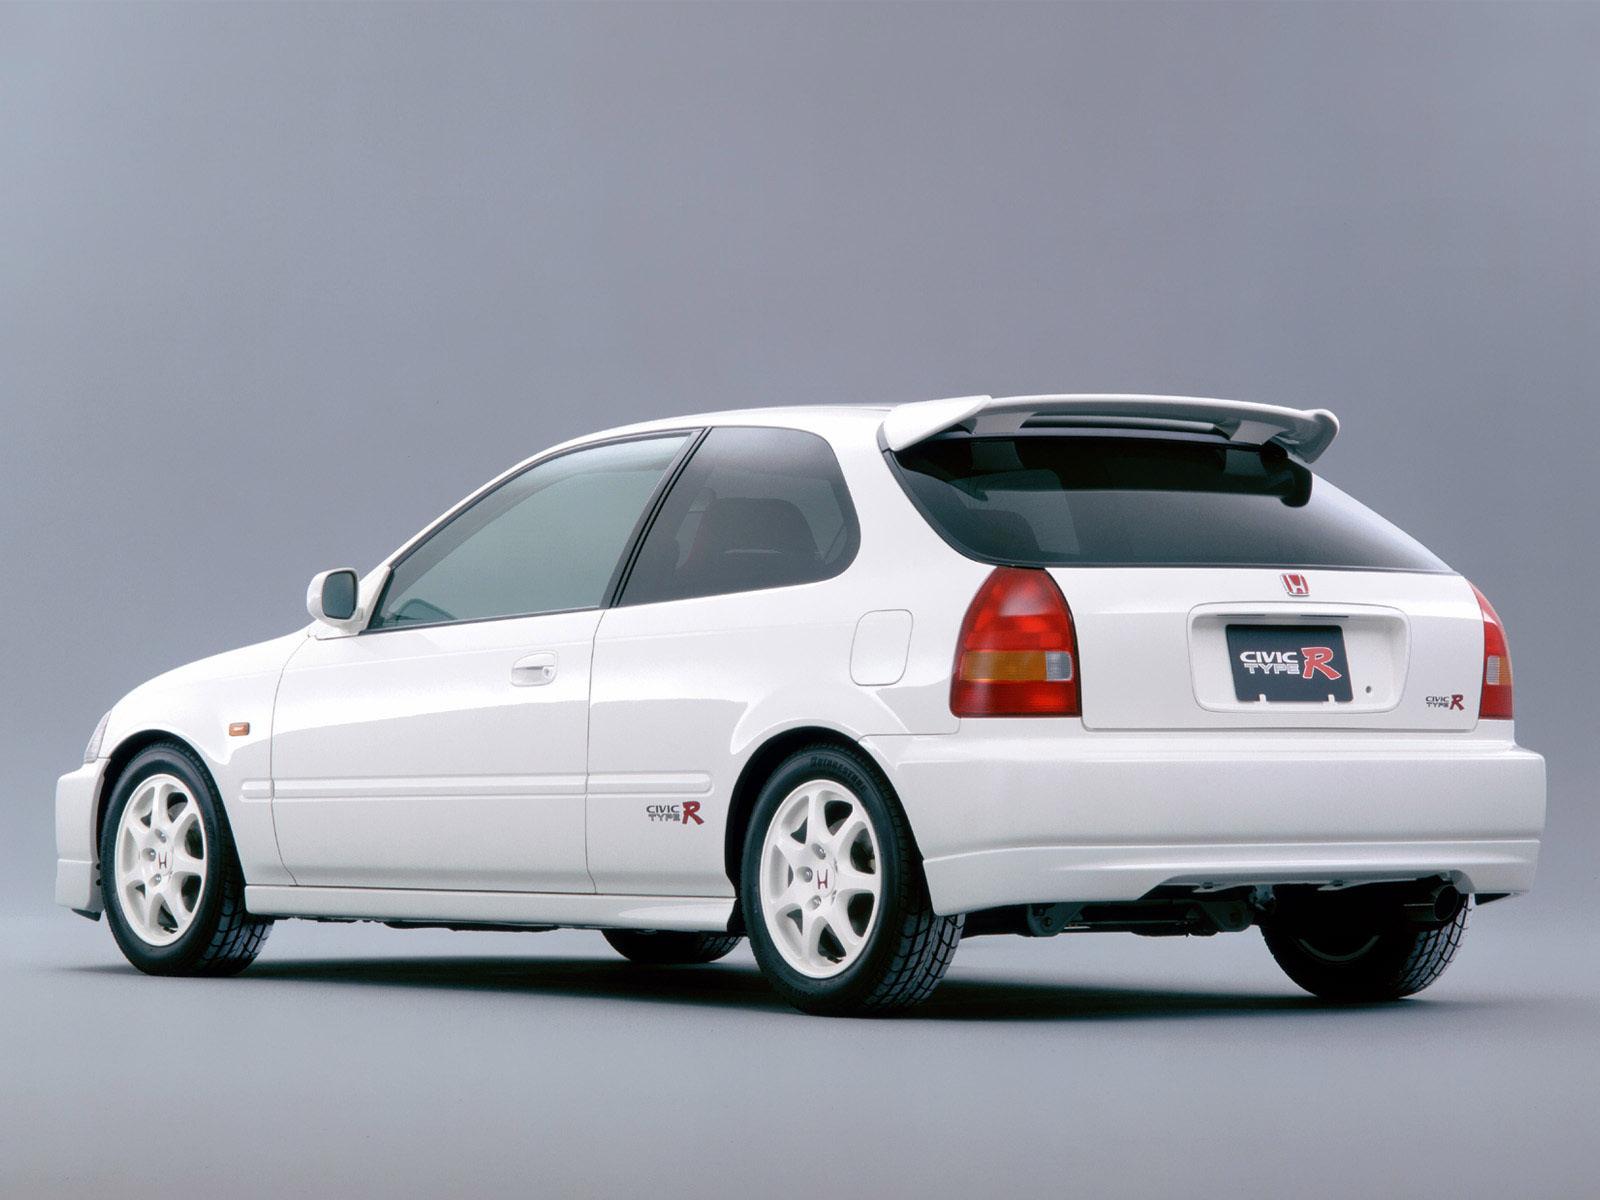 Honda Civic Type R 2015 >> 3DTuning of Honda Civic Type-R 3 Door 1997 3DTuning.com - unique on-line car configurator for ...